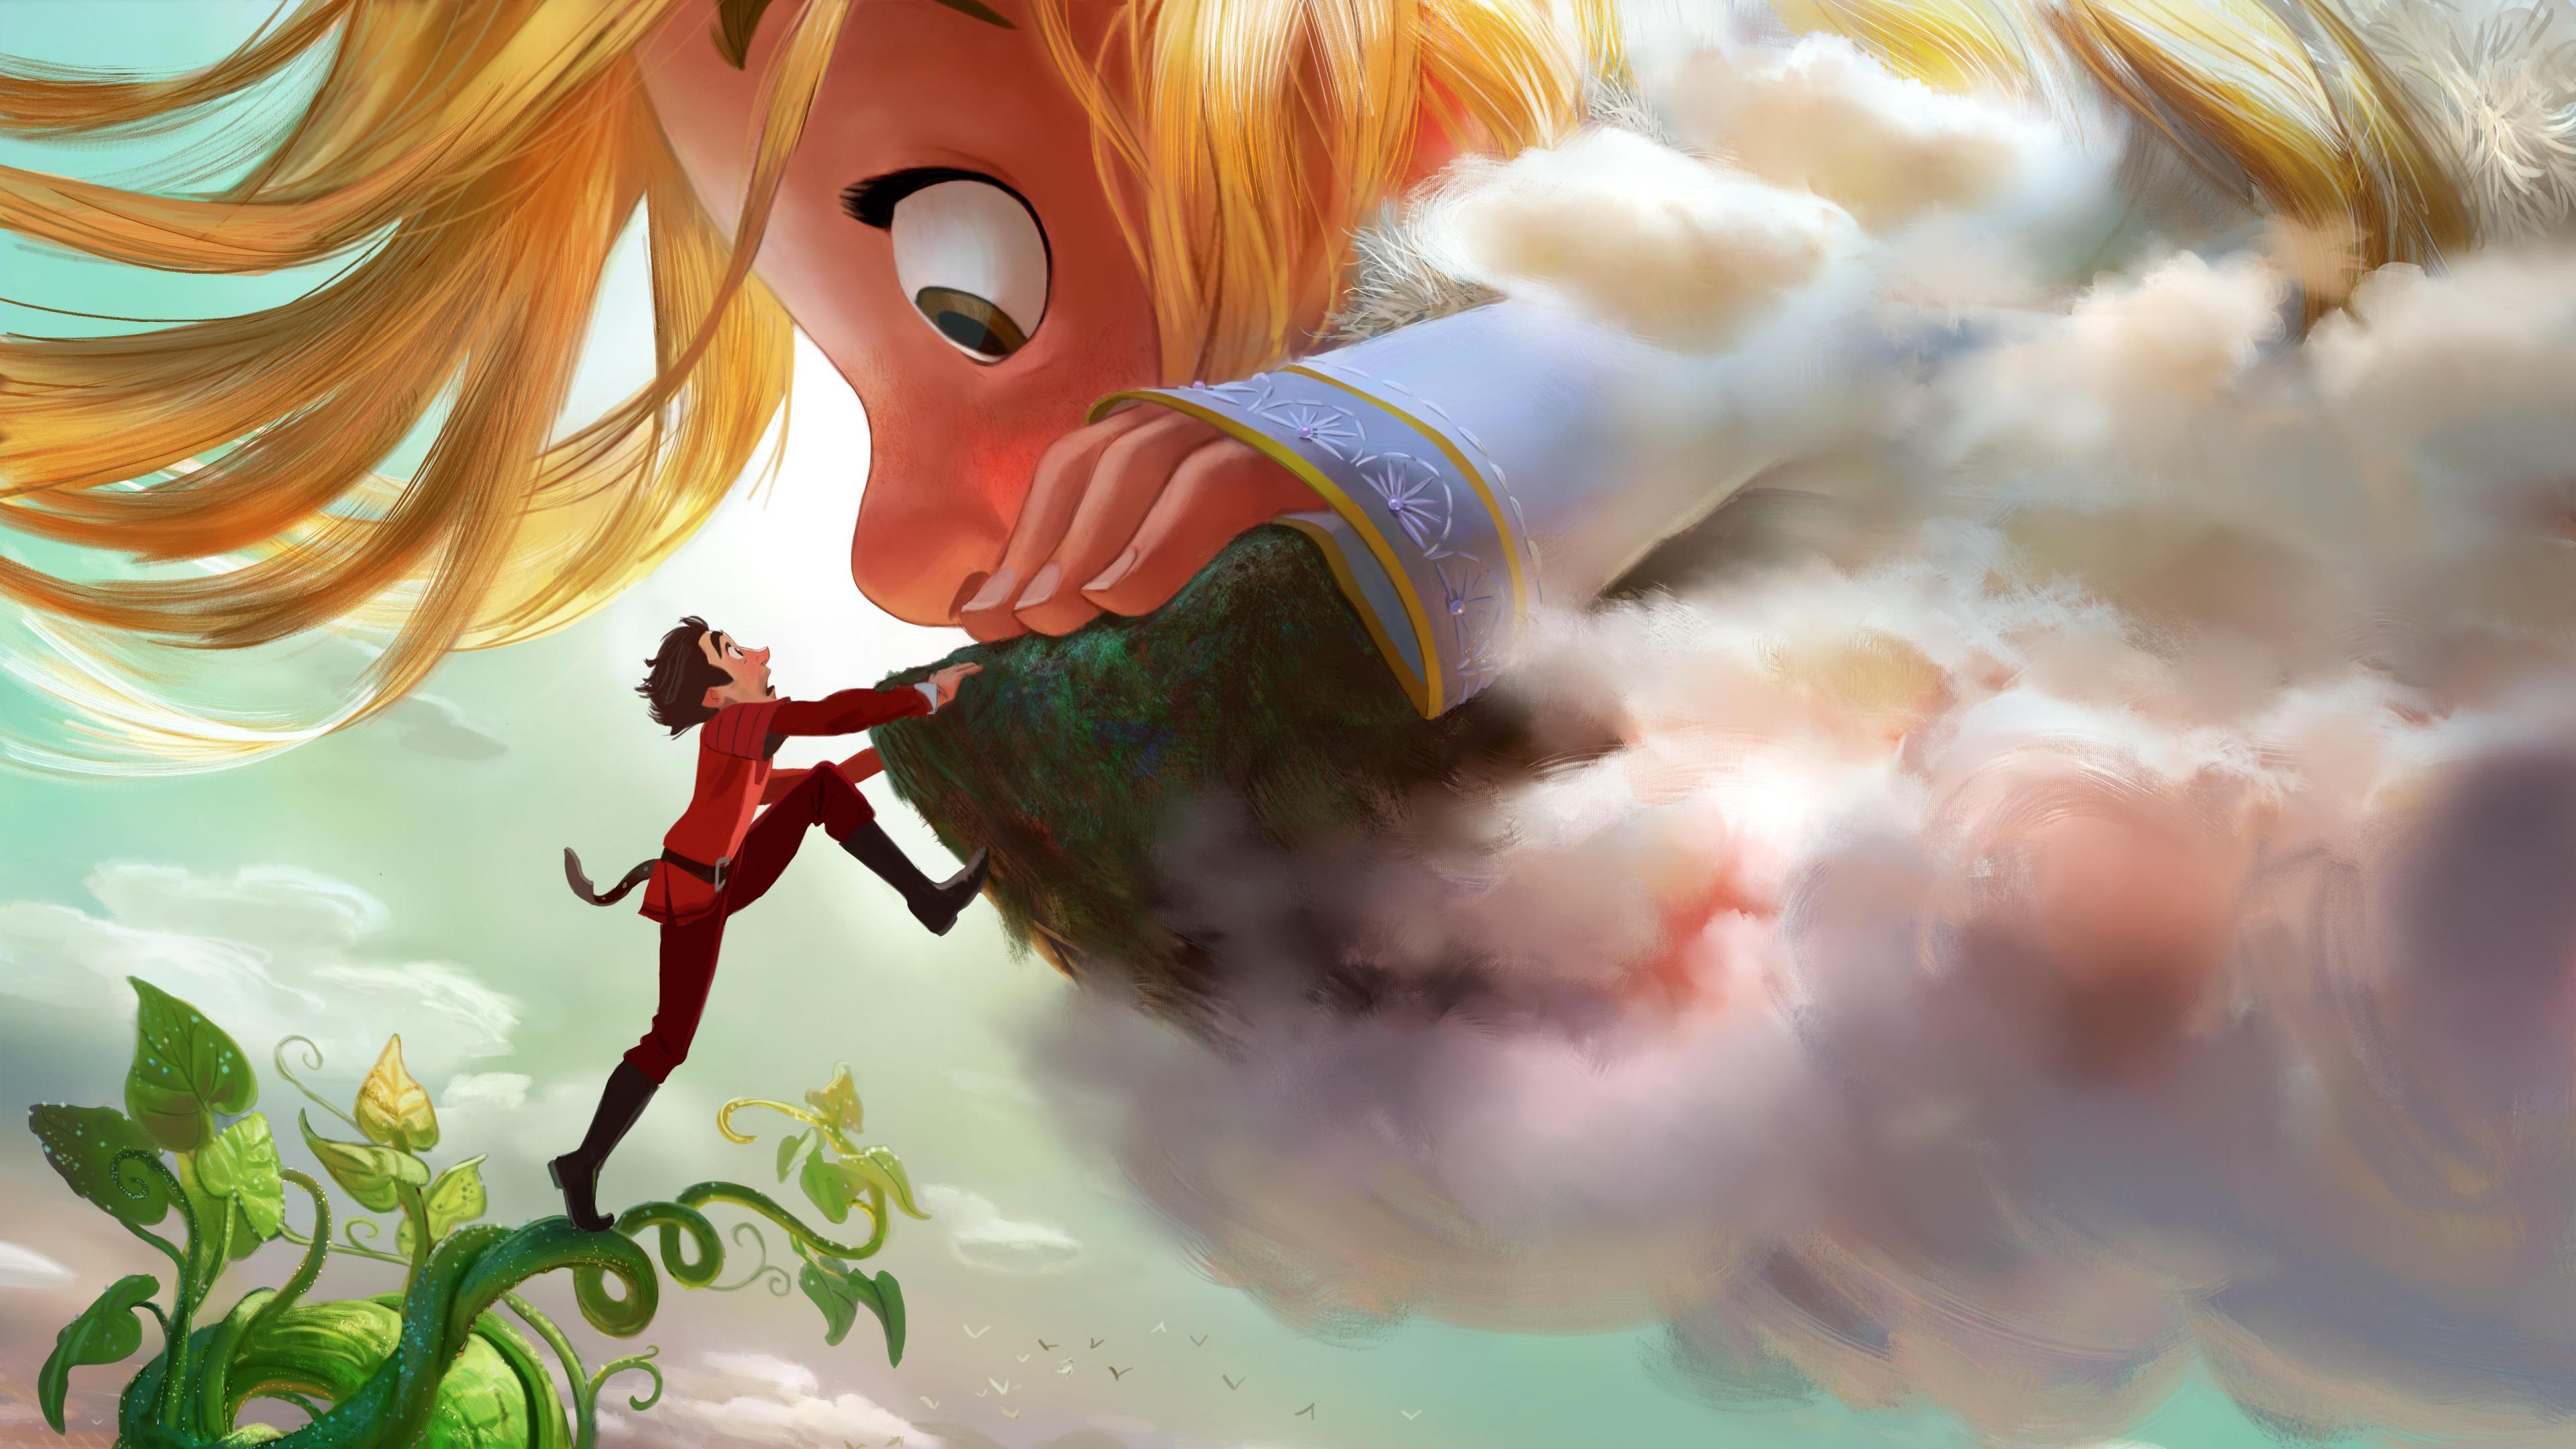 disney gigantic 2018 movie 1536400205 - Disney Gigantic 2018 Movie - movies wallpapers, gigantic wallpapers, disney wallpapers, animated movies wallpapers, 2018-movies-wallpapers